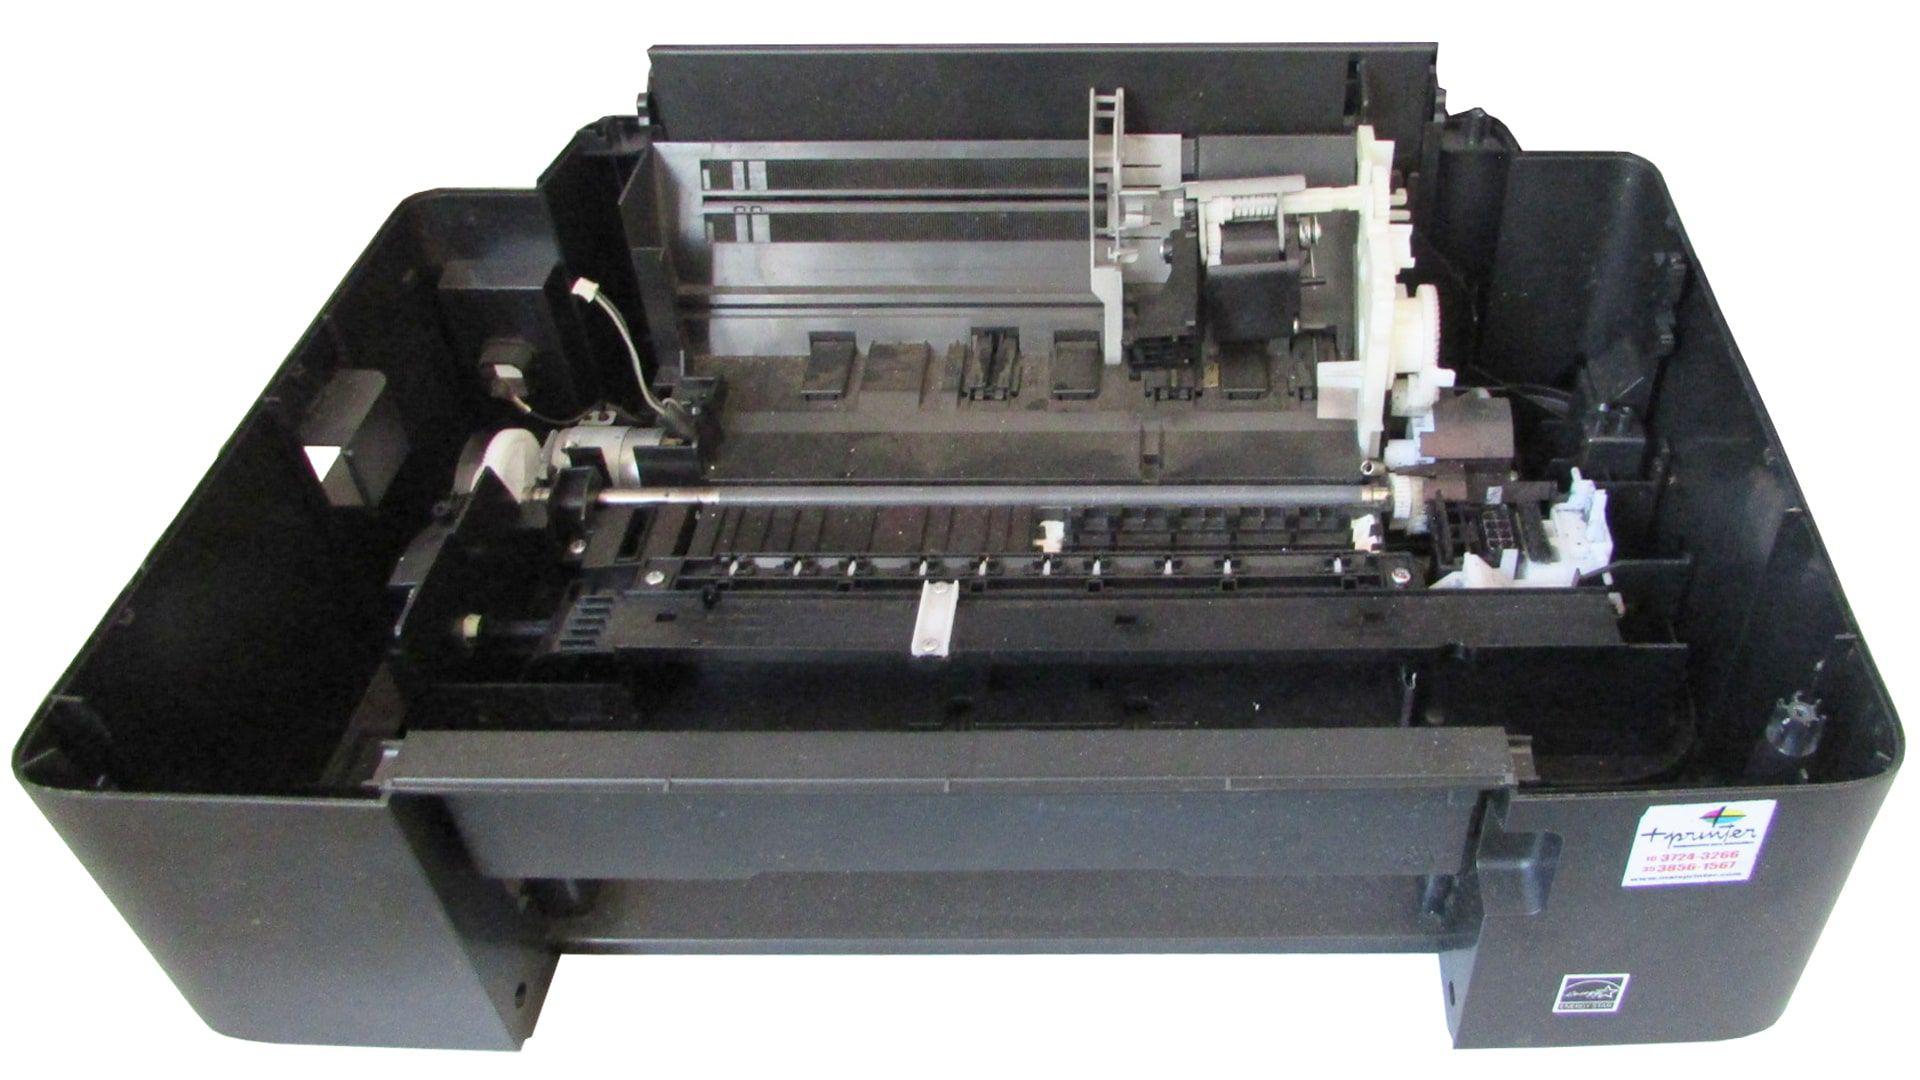 Carcaça Inferior Impressora Epson L200 Retirado